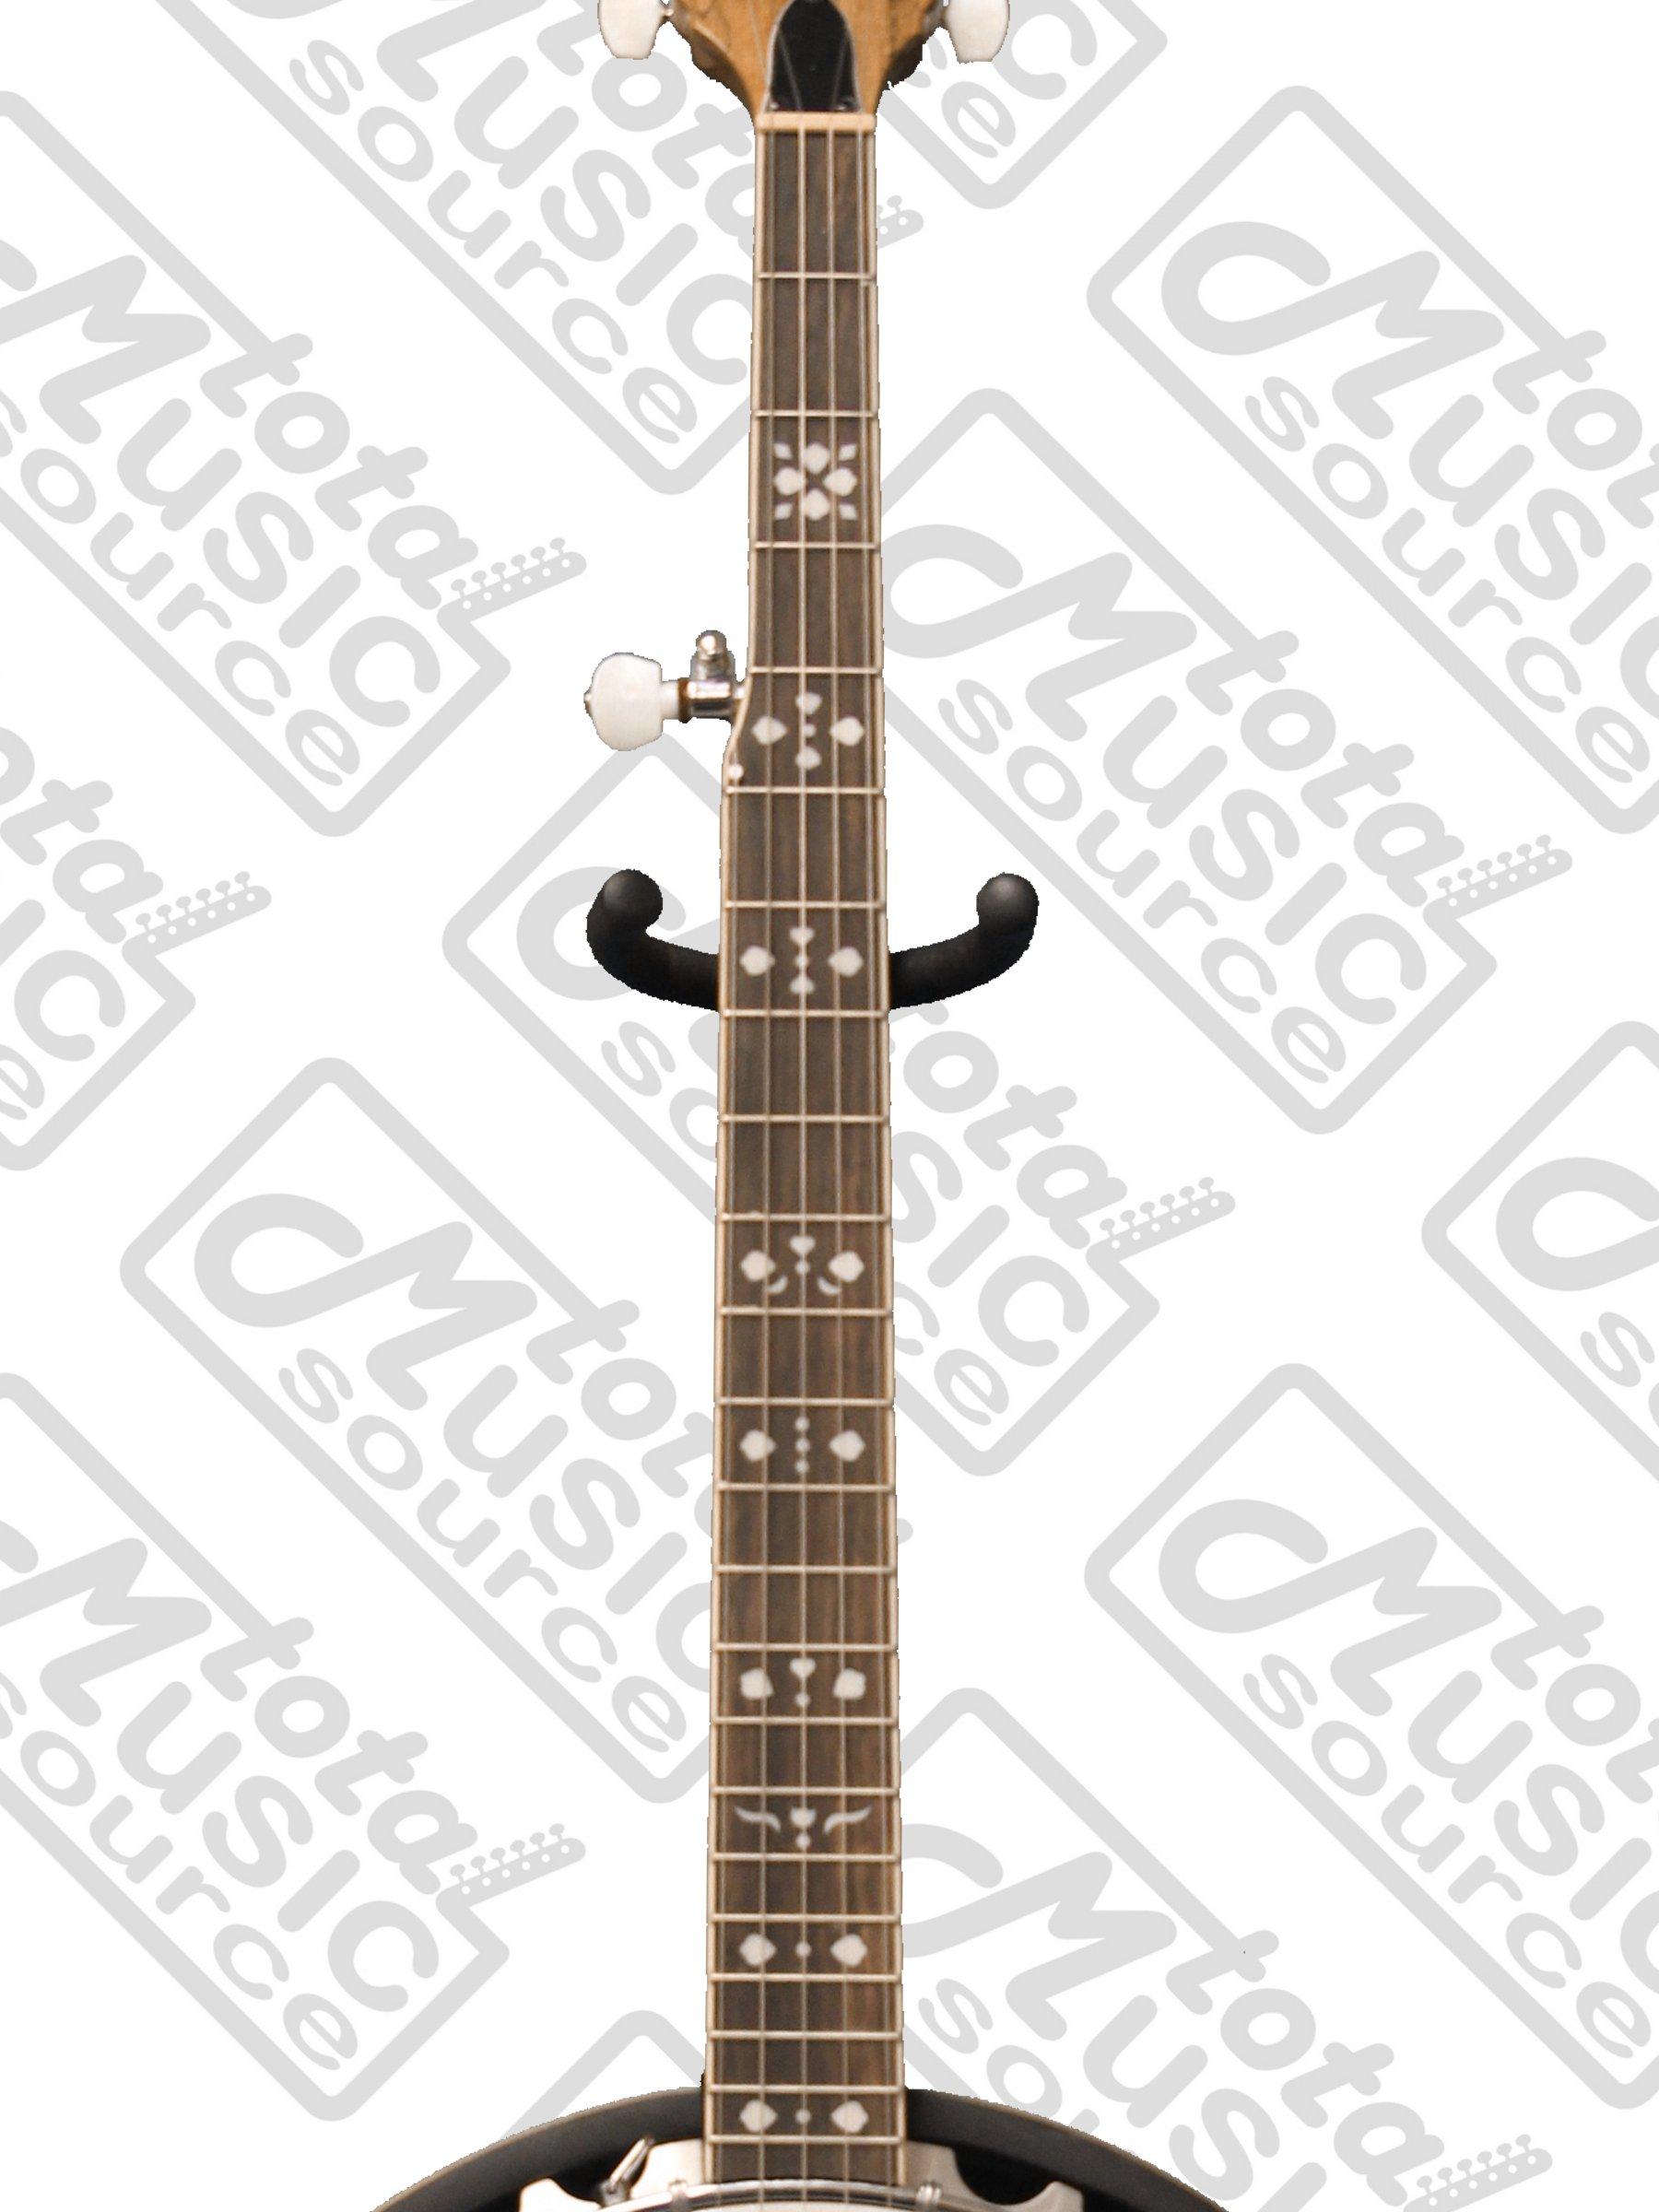 Oscar Schmidt OB5SP 5-String Banjo, Remo Head,Spalted Maple Resonator, Gloss Finish by Oscar Schmidt (Image #3)